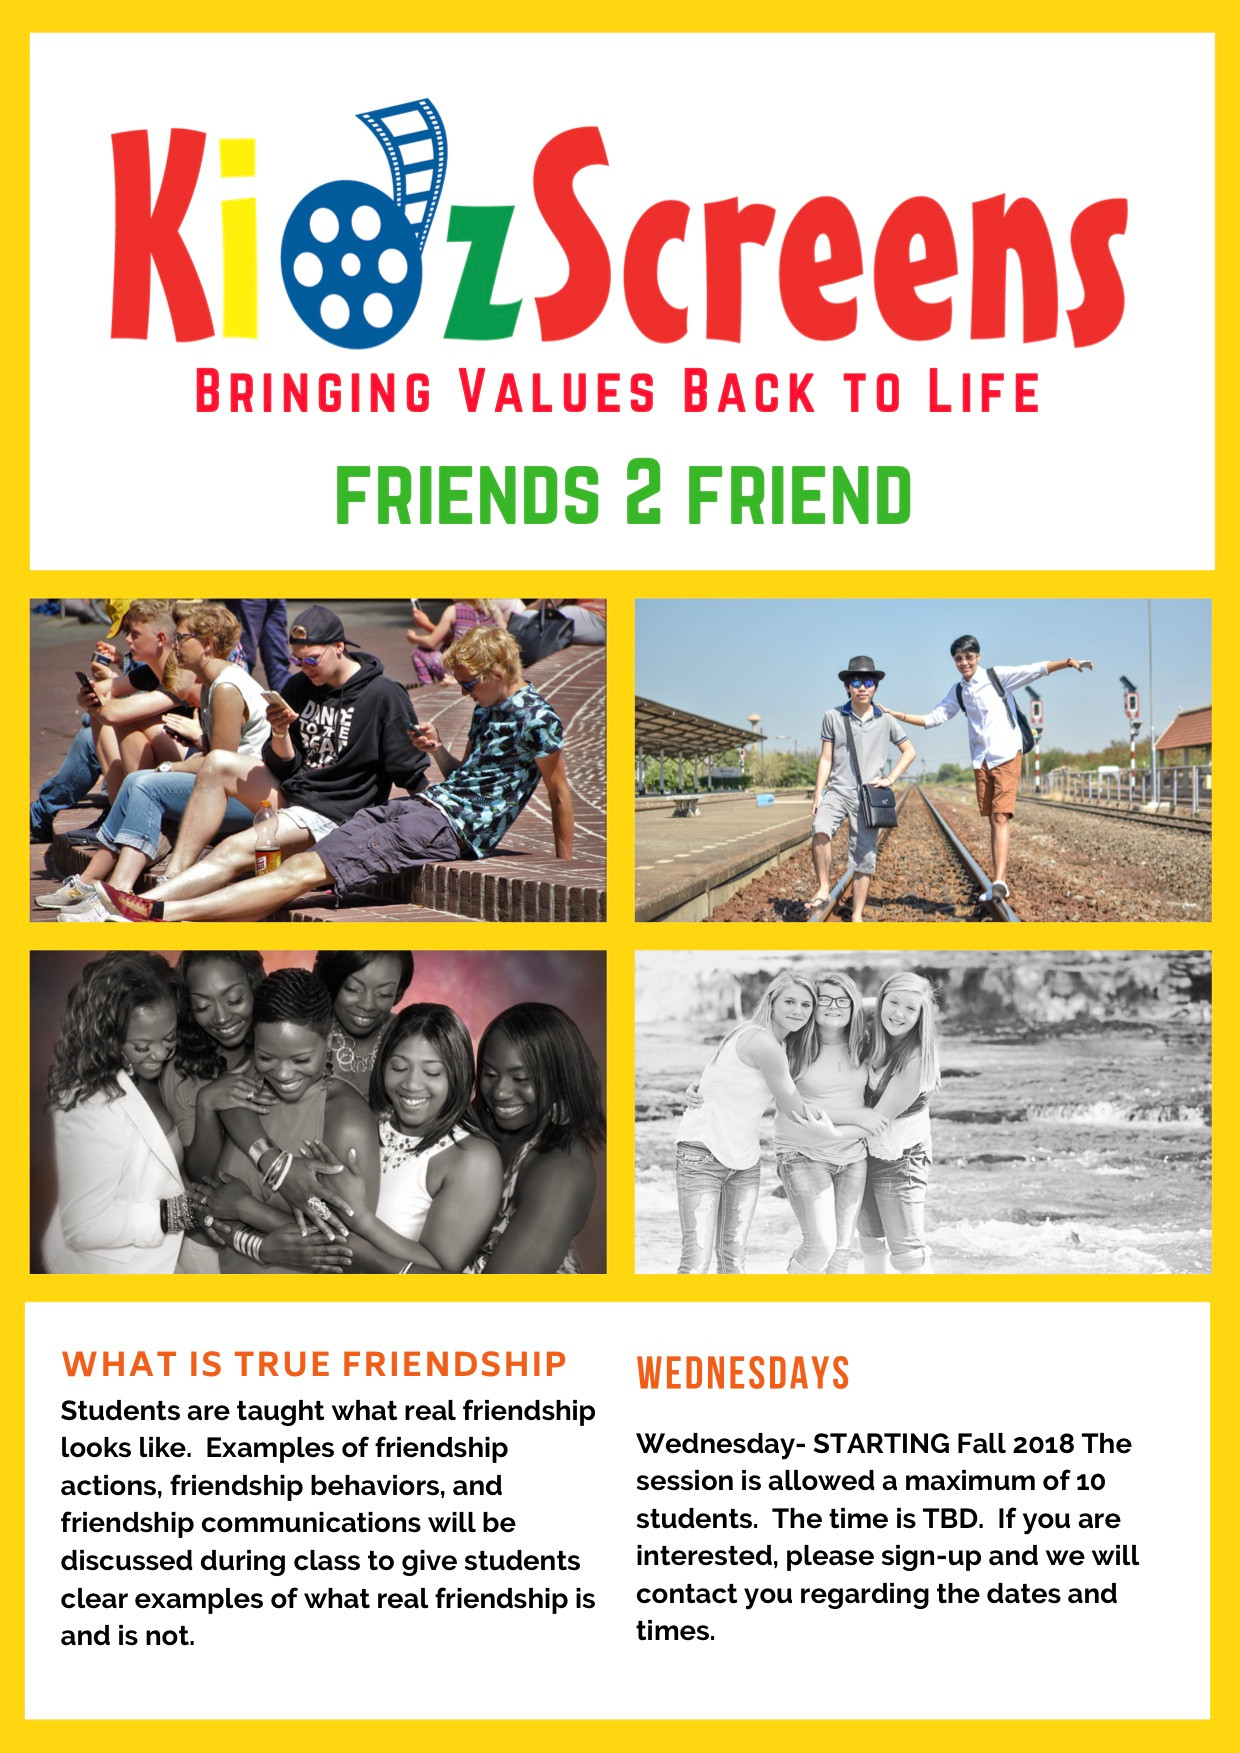 Friends 2 Friend